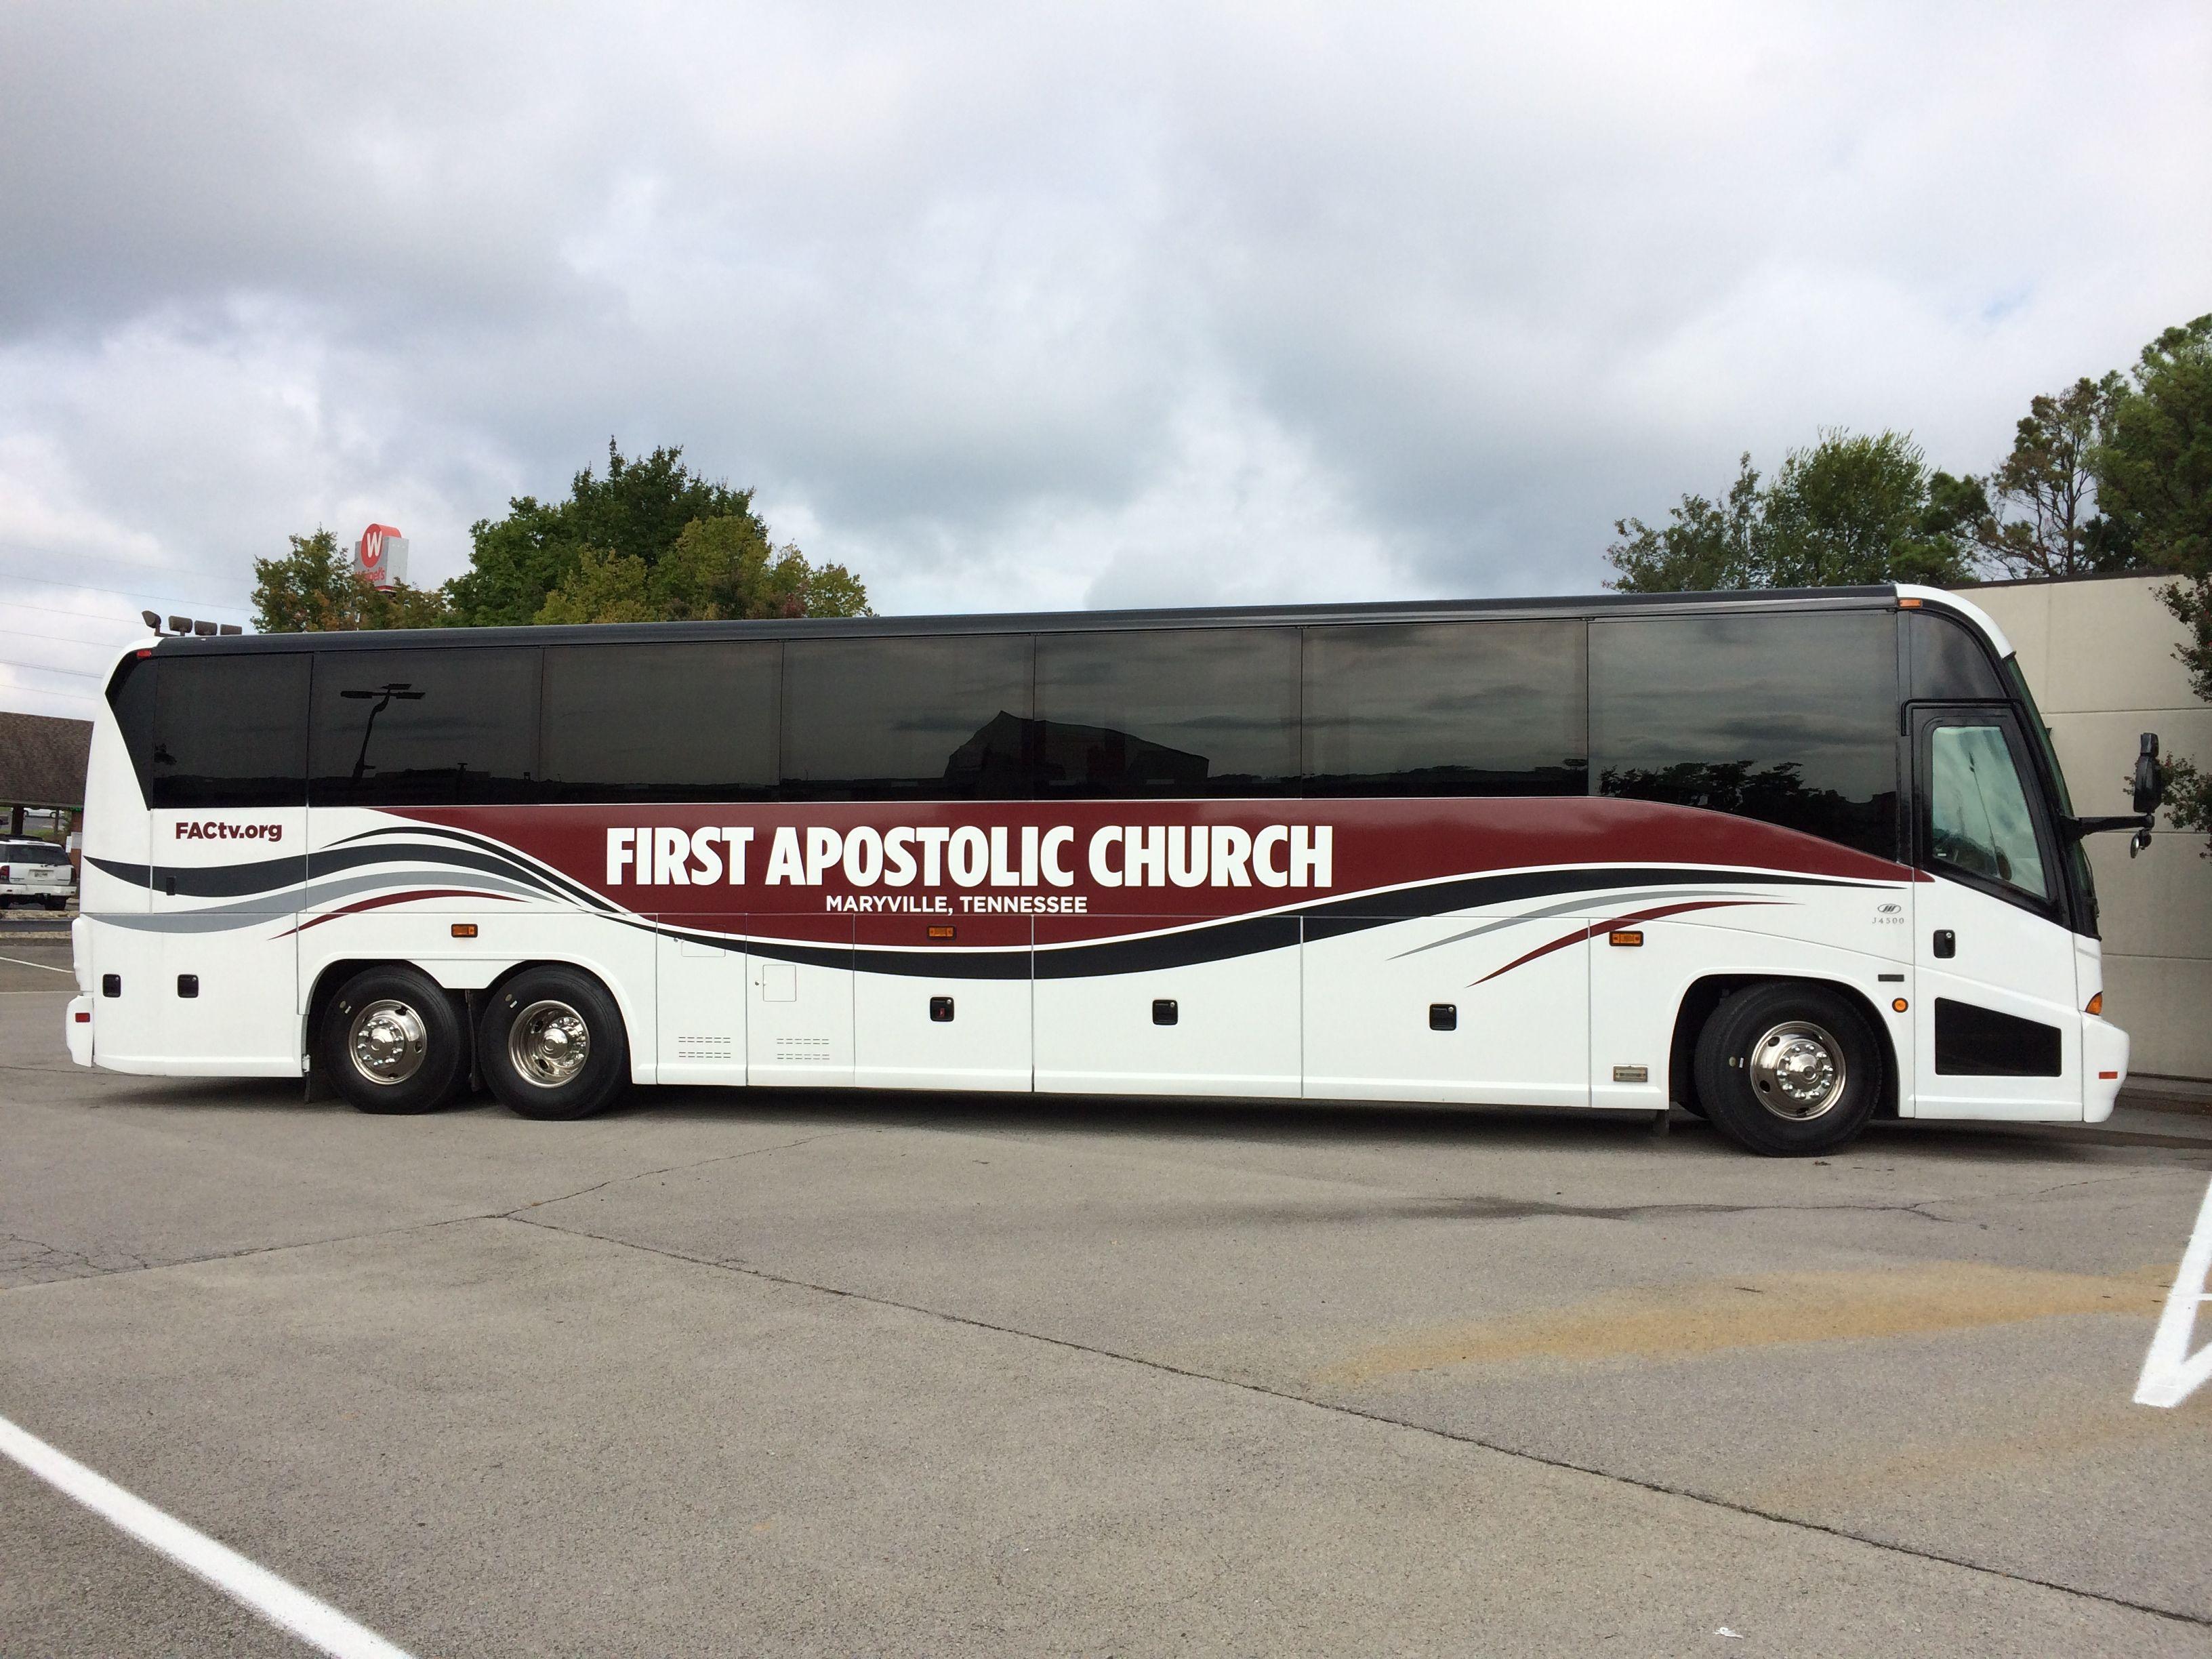 First Apostolic Church Bus Wrap Car Wrap R Vinyl Van Wrap